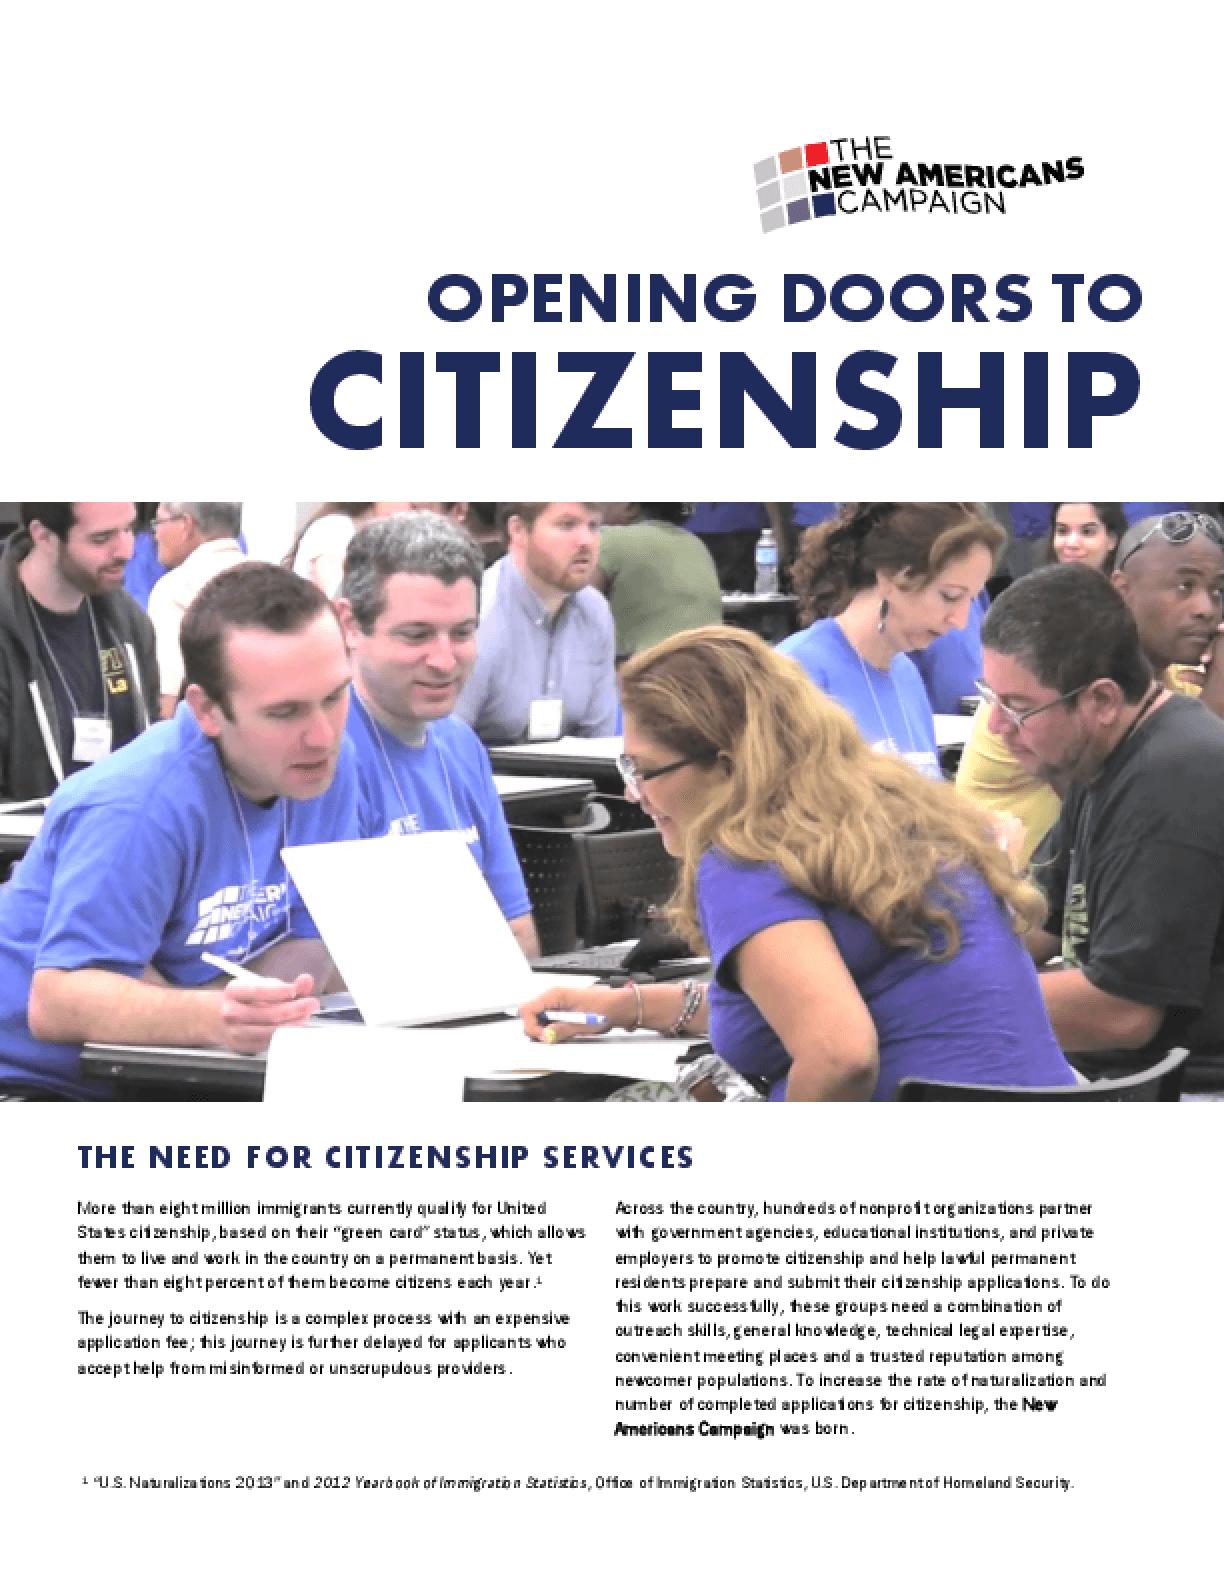 Opening Doors to Citizenship (Summary)